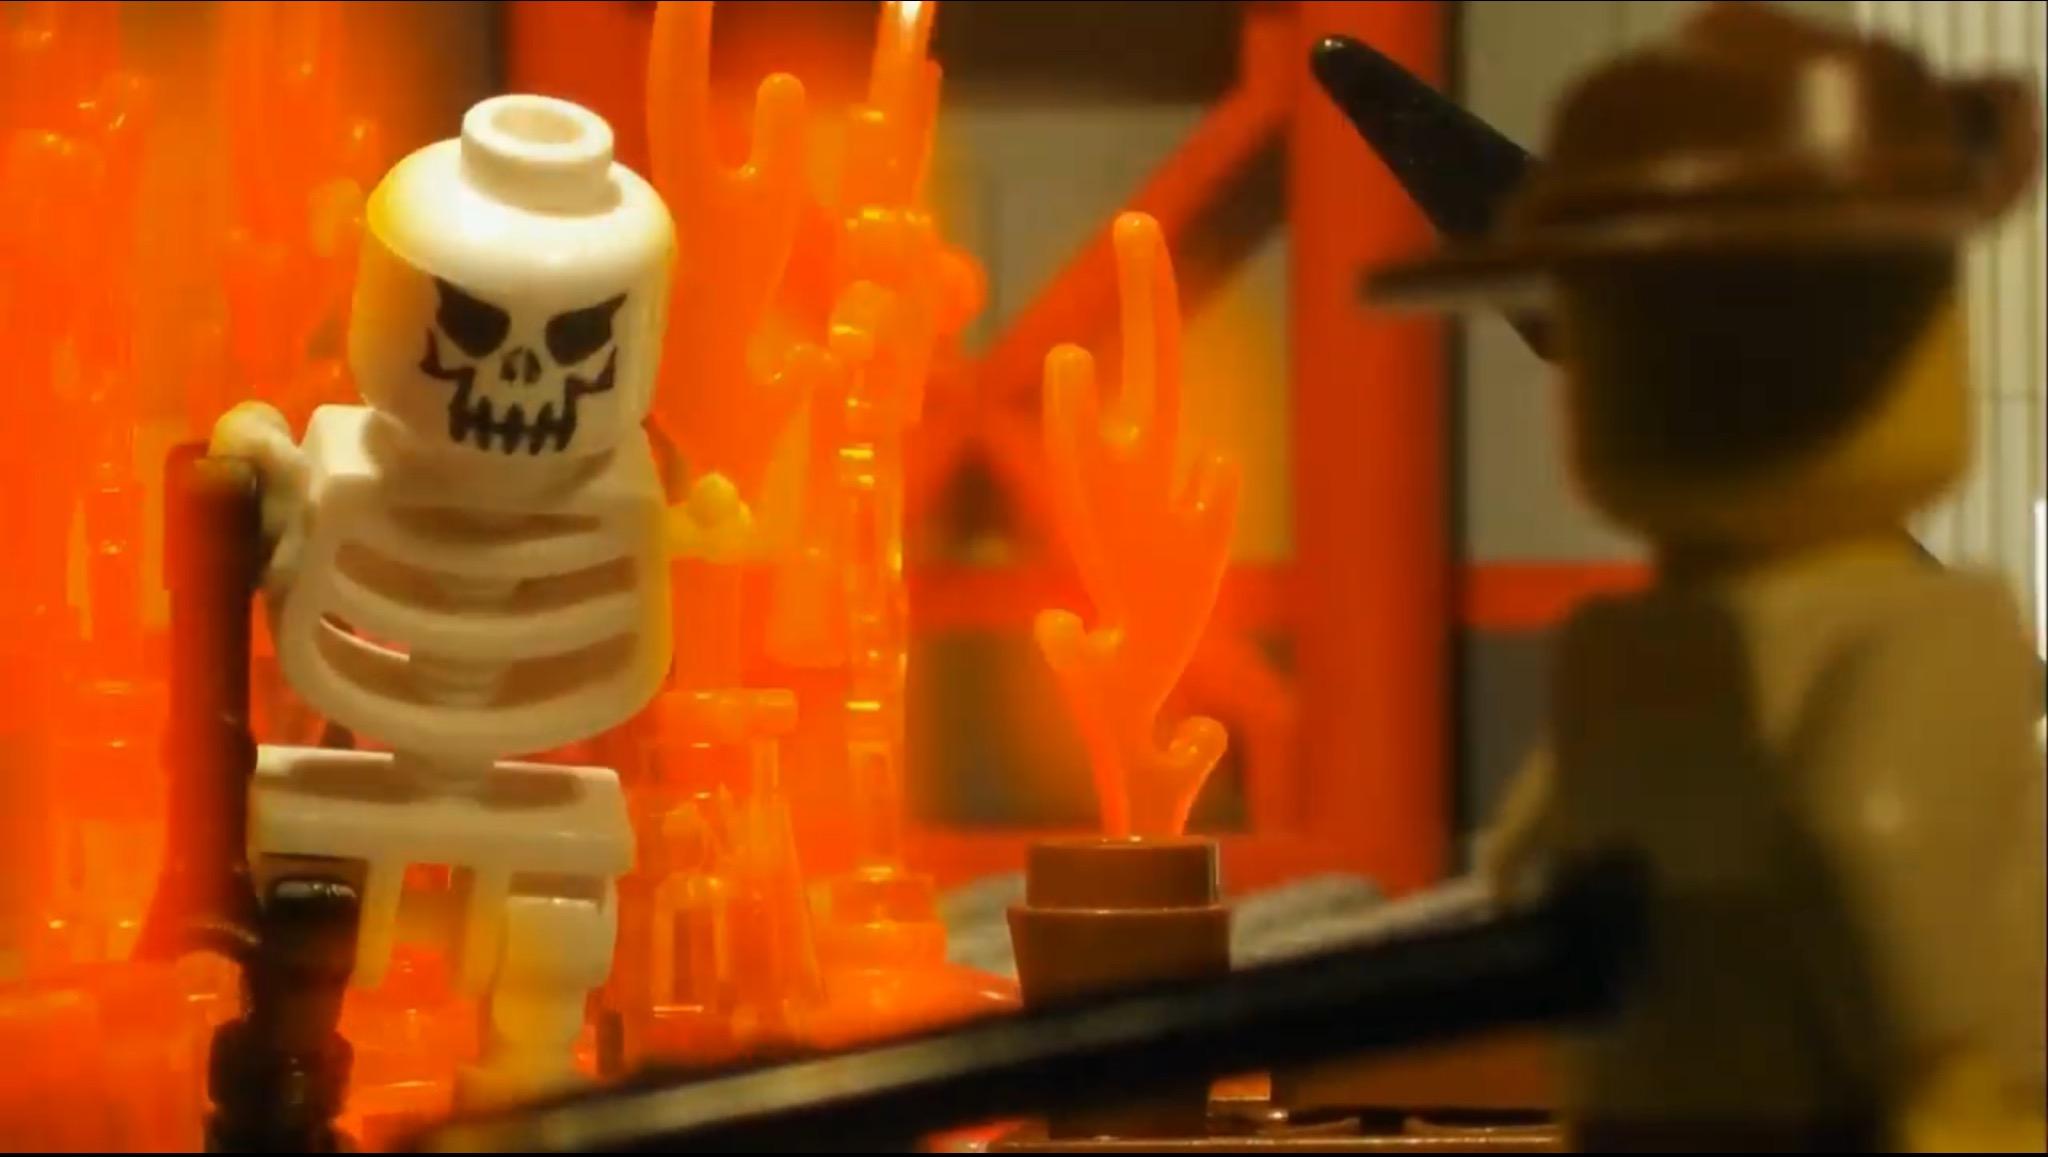 https://bricksafe.com/files/LegoSkeleton2000/guess-the-frame/FullSizeRender%282%29.jpg